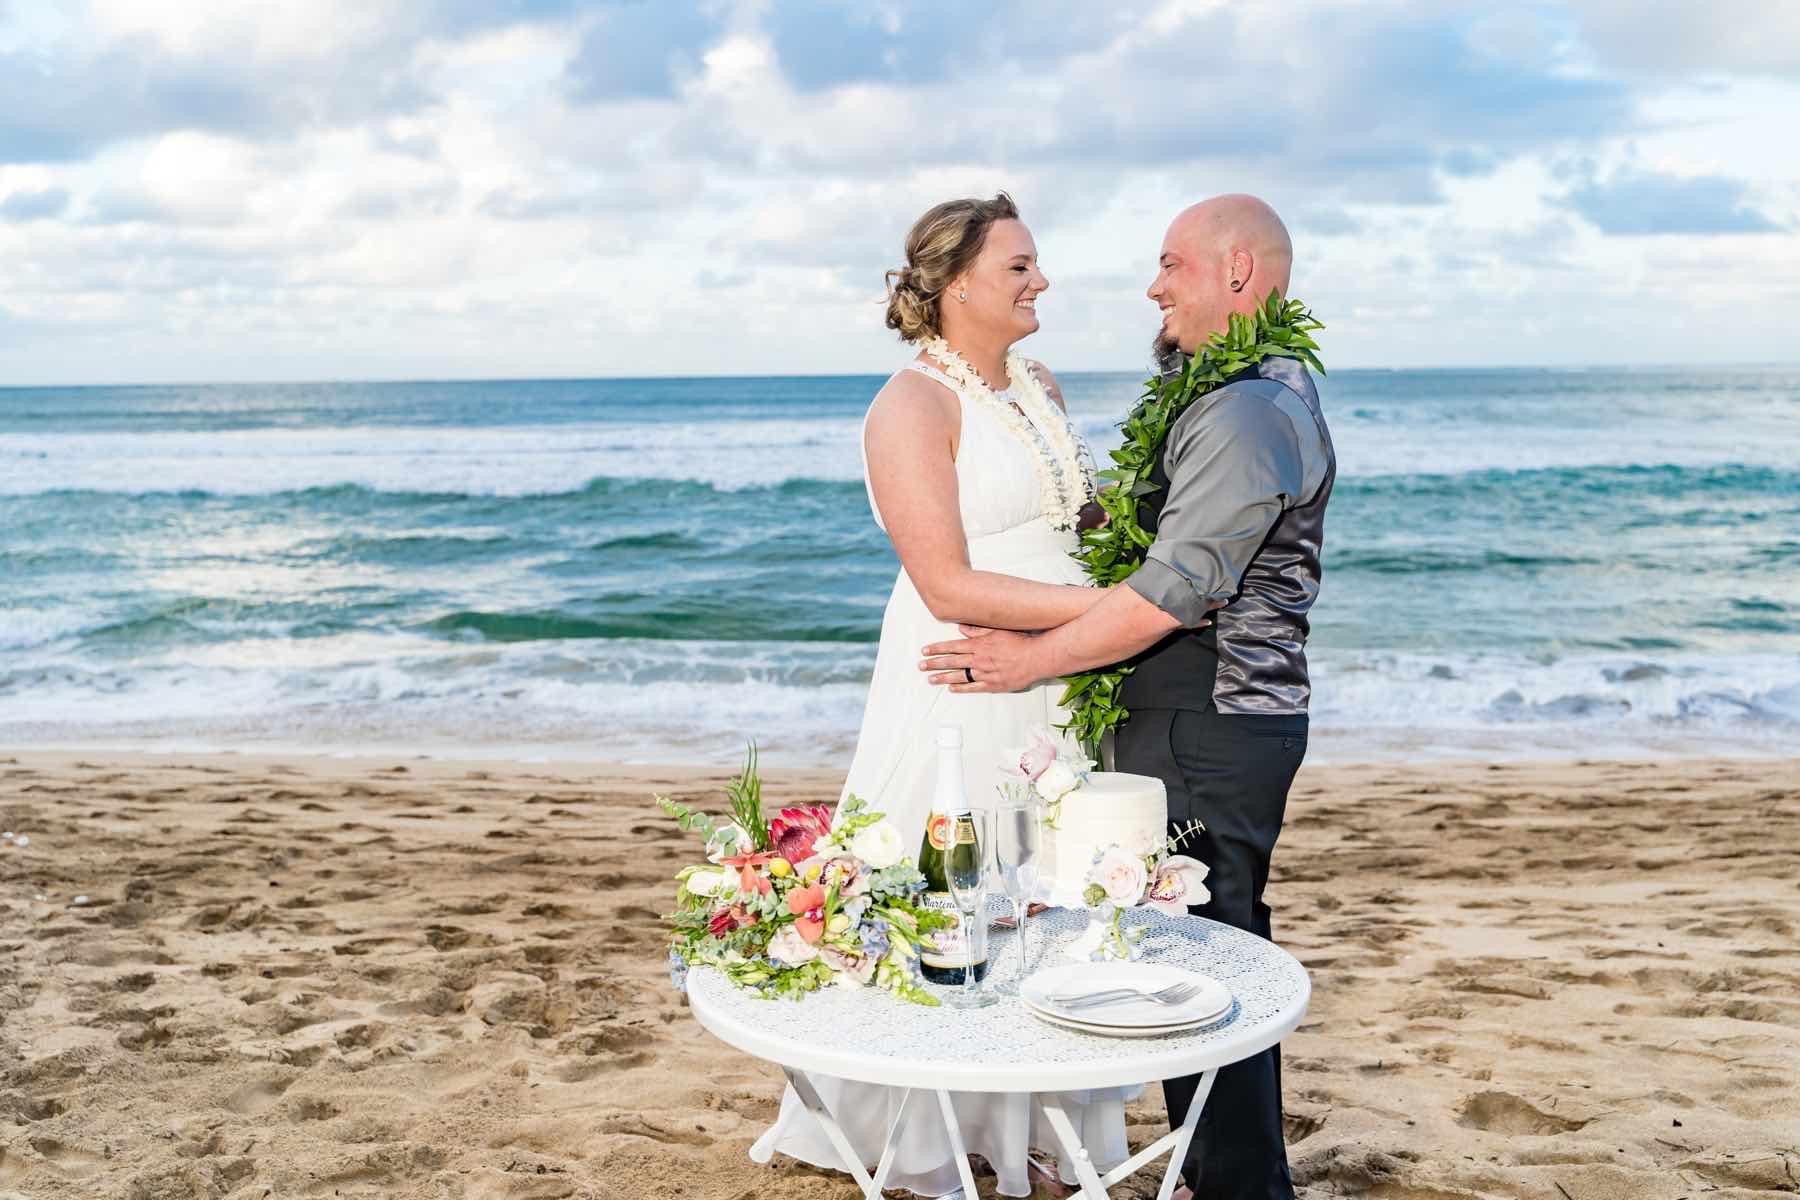 Sherice and Gary on their wedding day in Kauai.